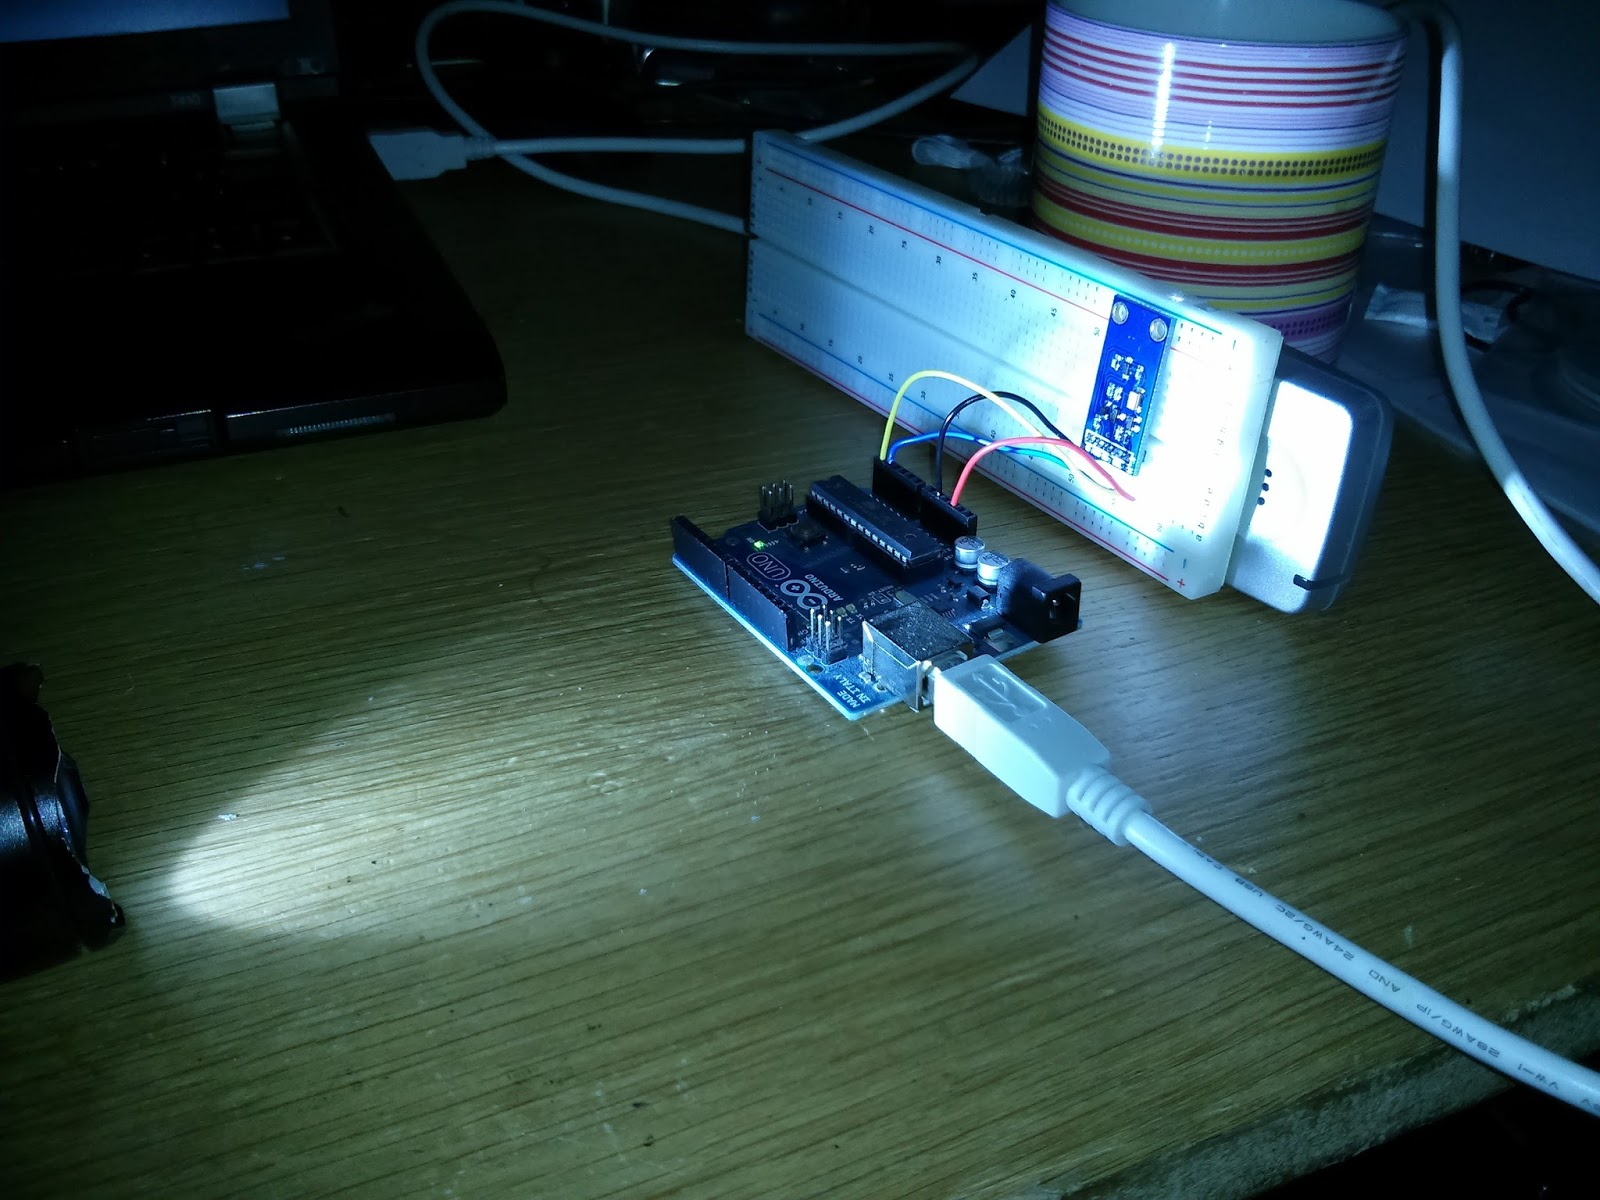 PIR Motion Sensor Tutorial - 1